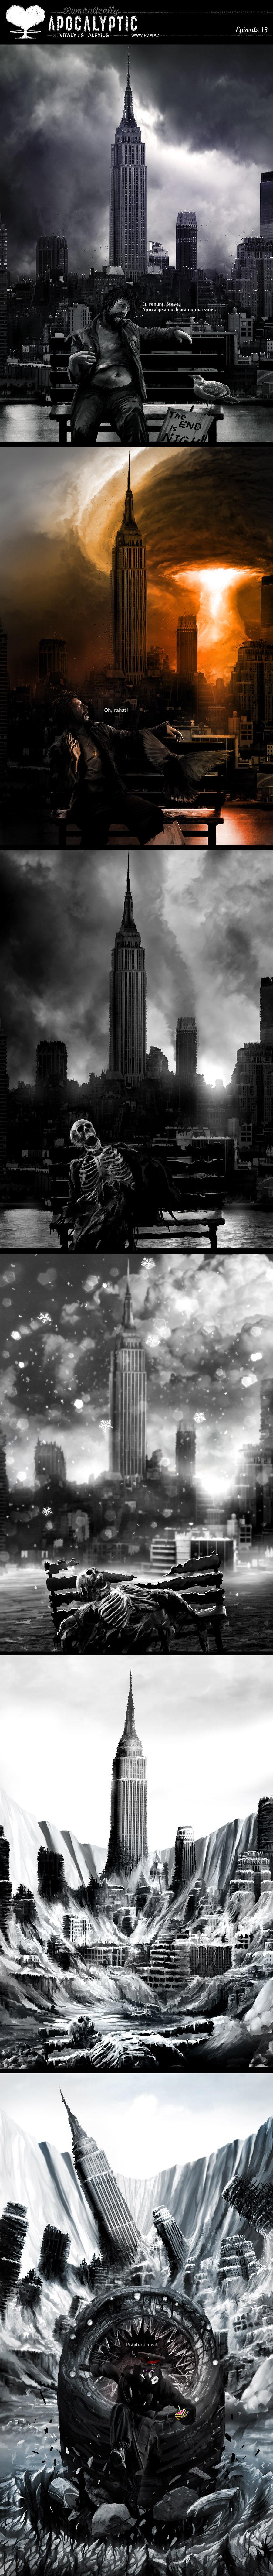 Romantically Apocalyptic 13 Ro by duleantovi